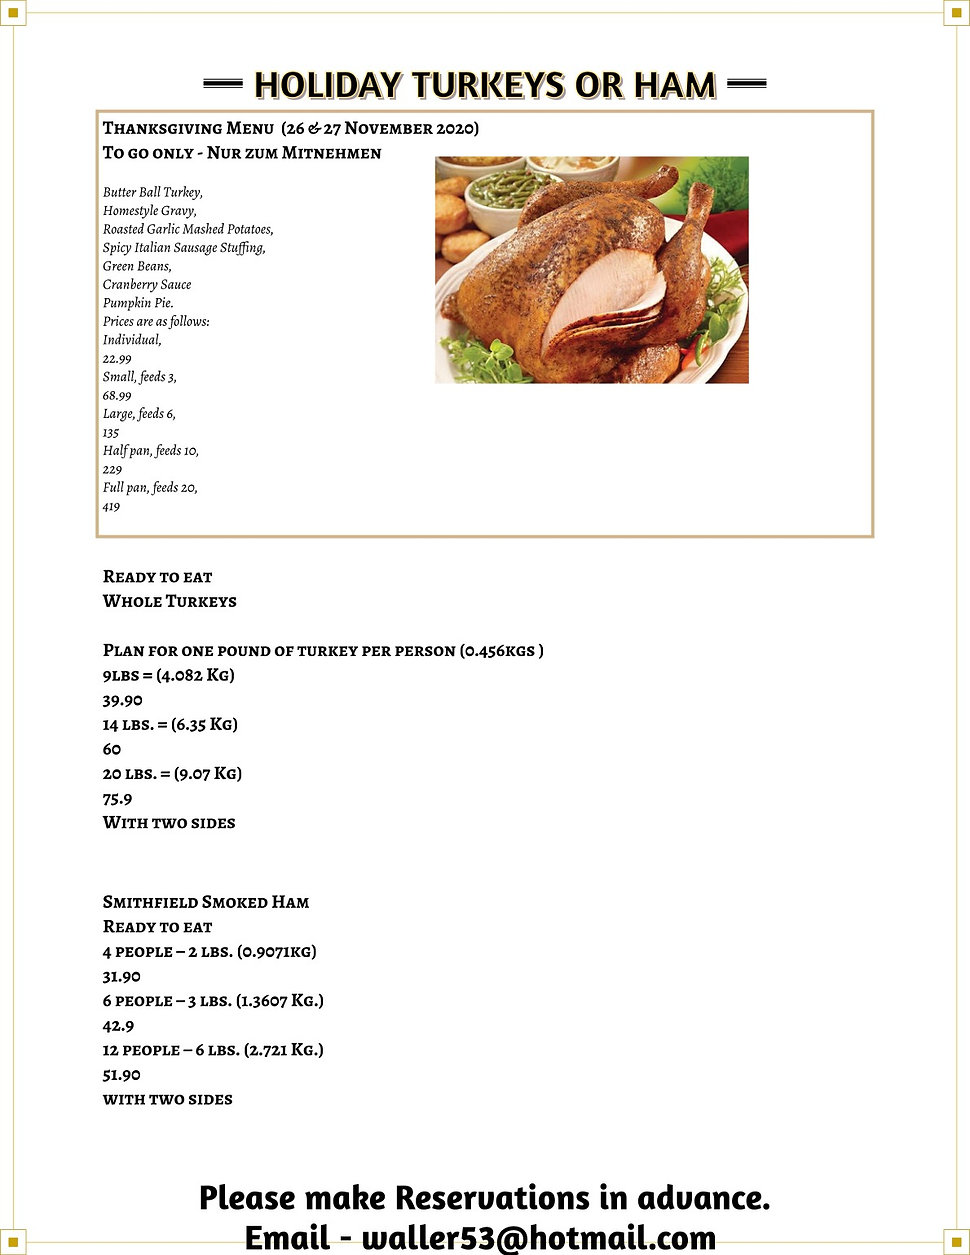 Hoiliday Turkeys_page-1 (7).jpg